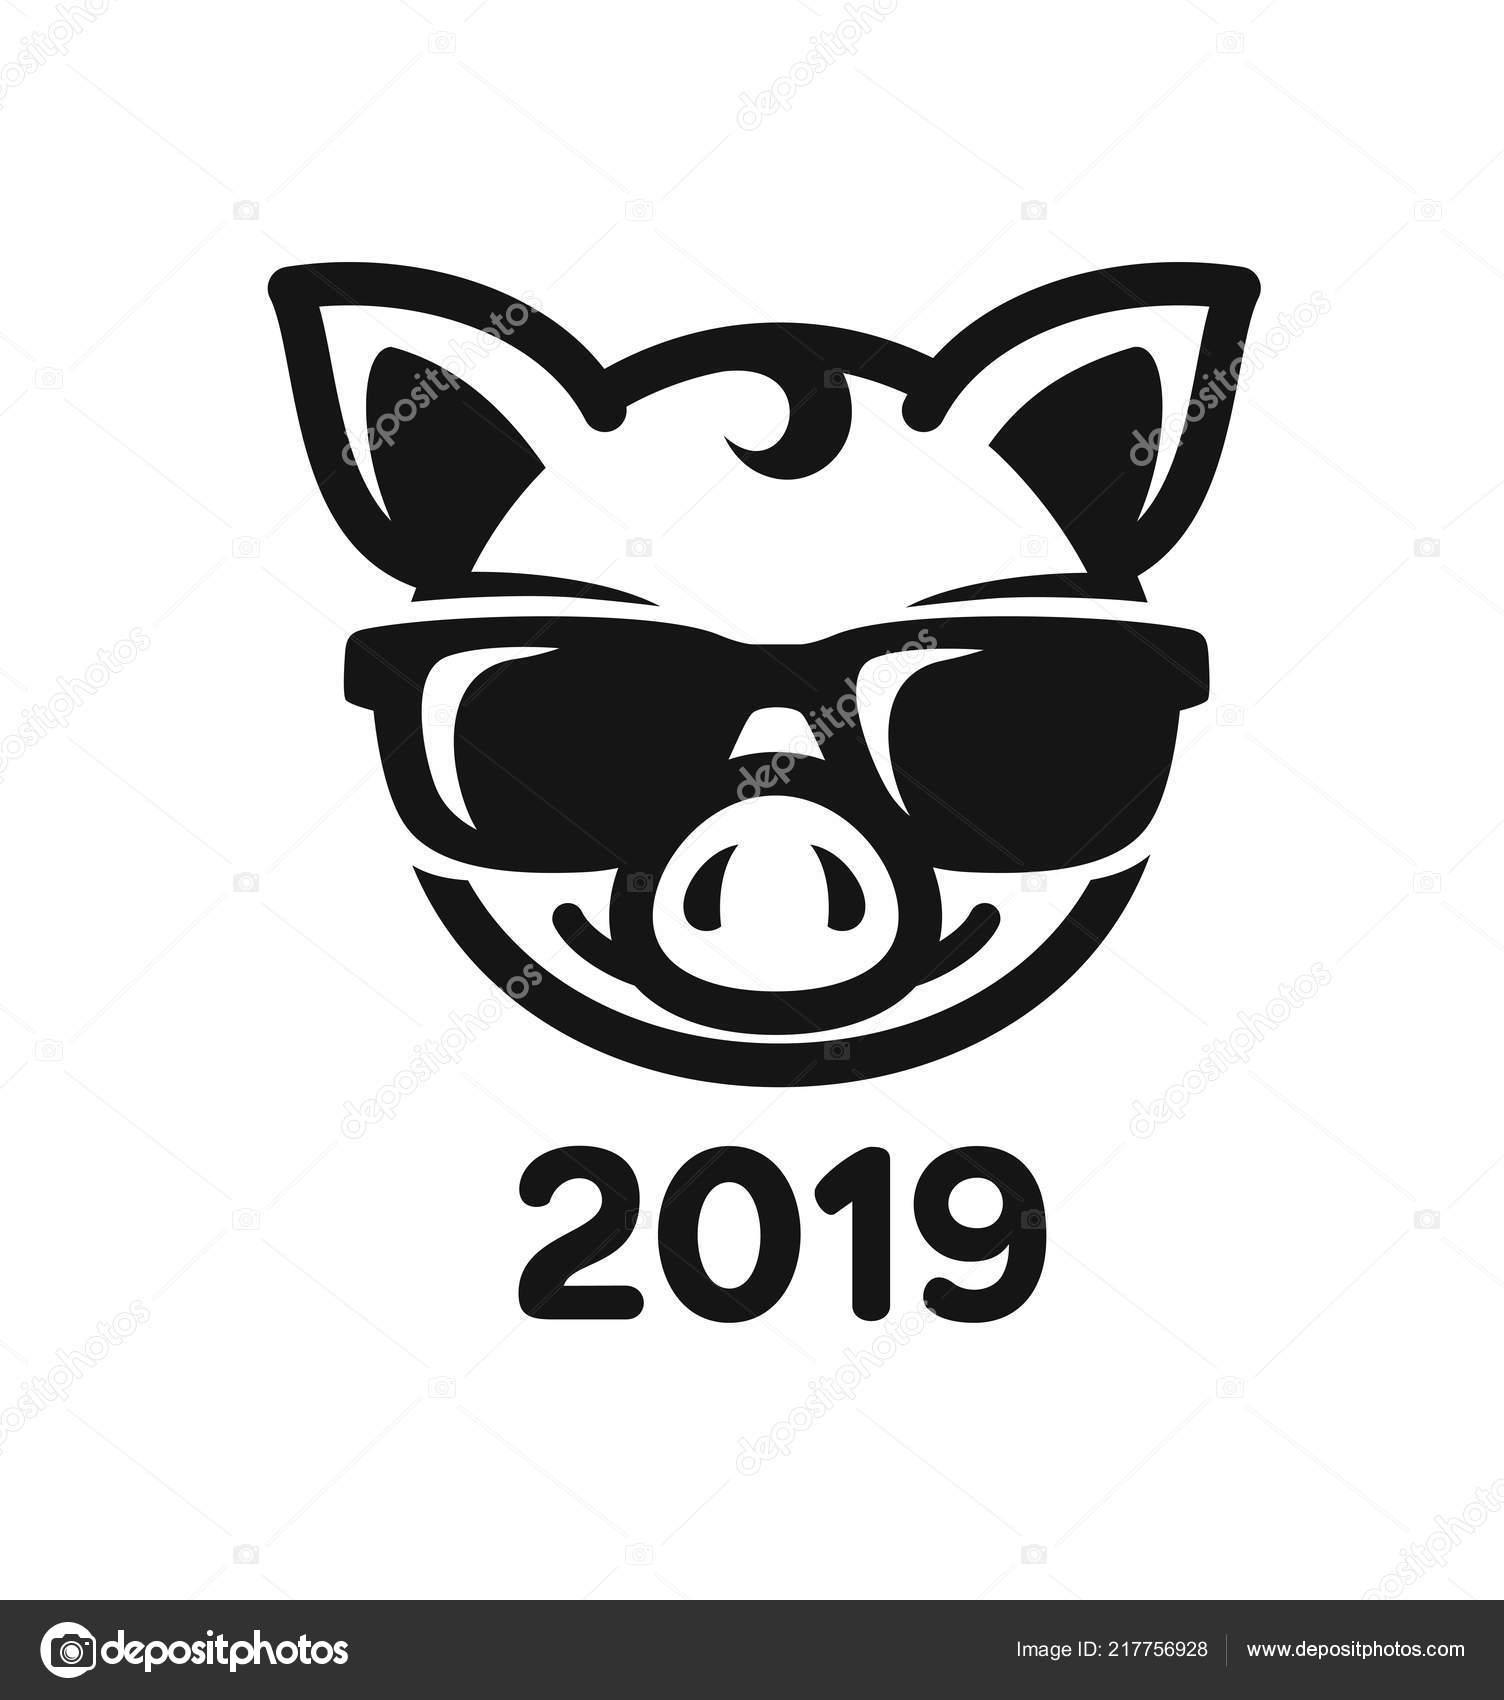 images new year symbols